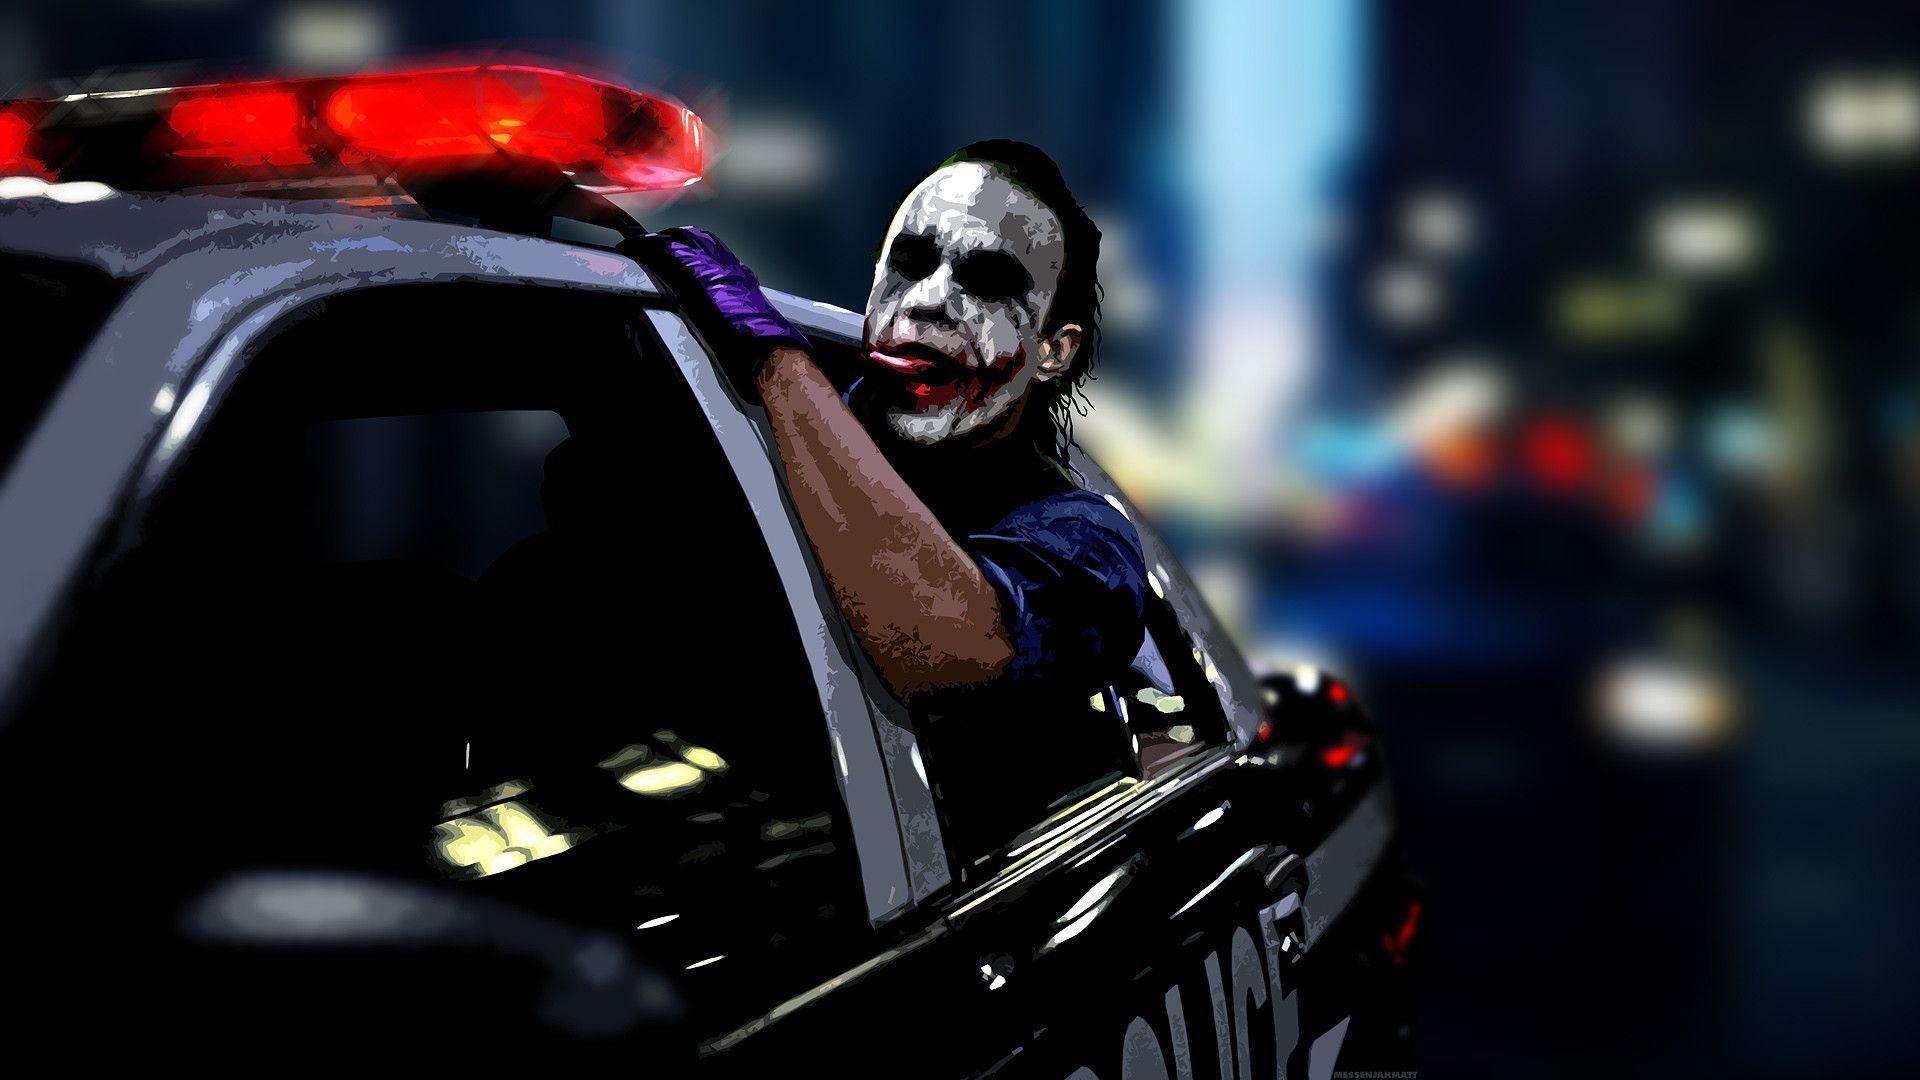 Joker Wallpapers Full Hd Wallpaper Search Page Download